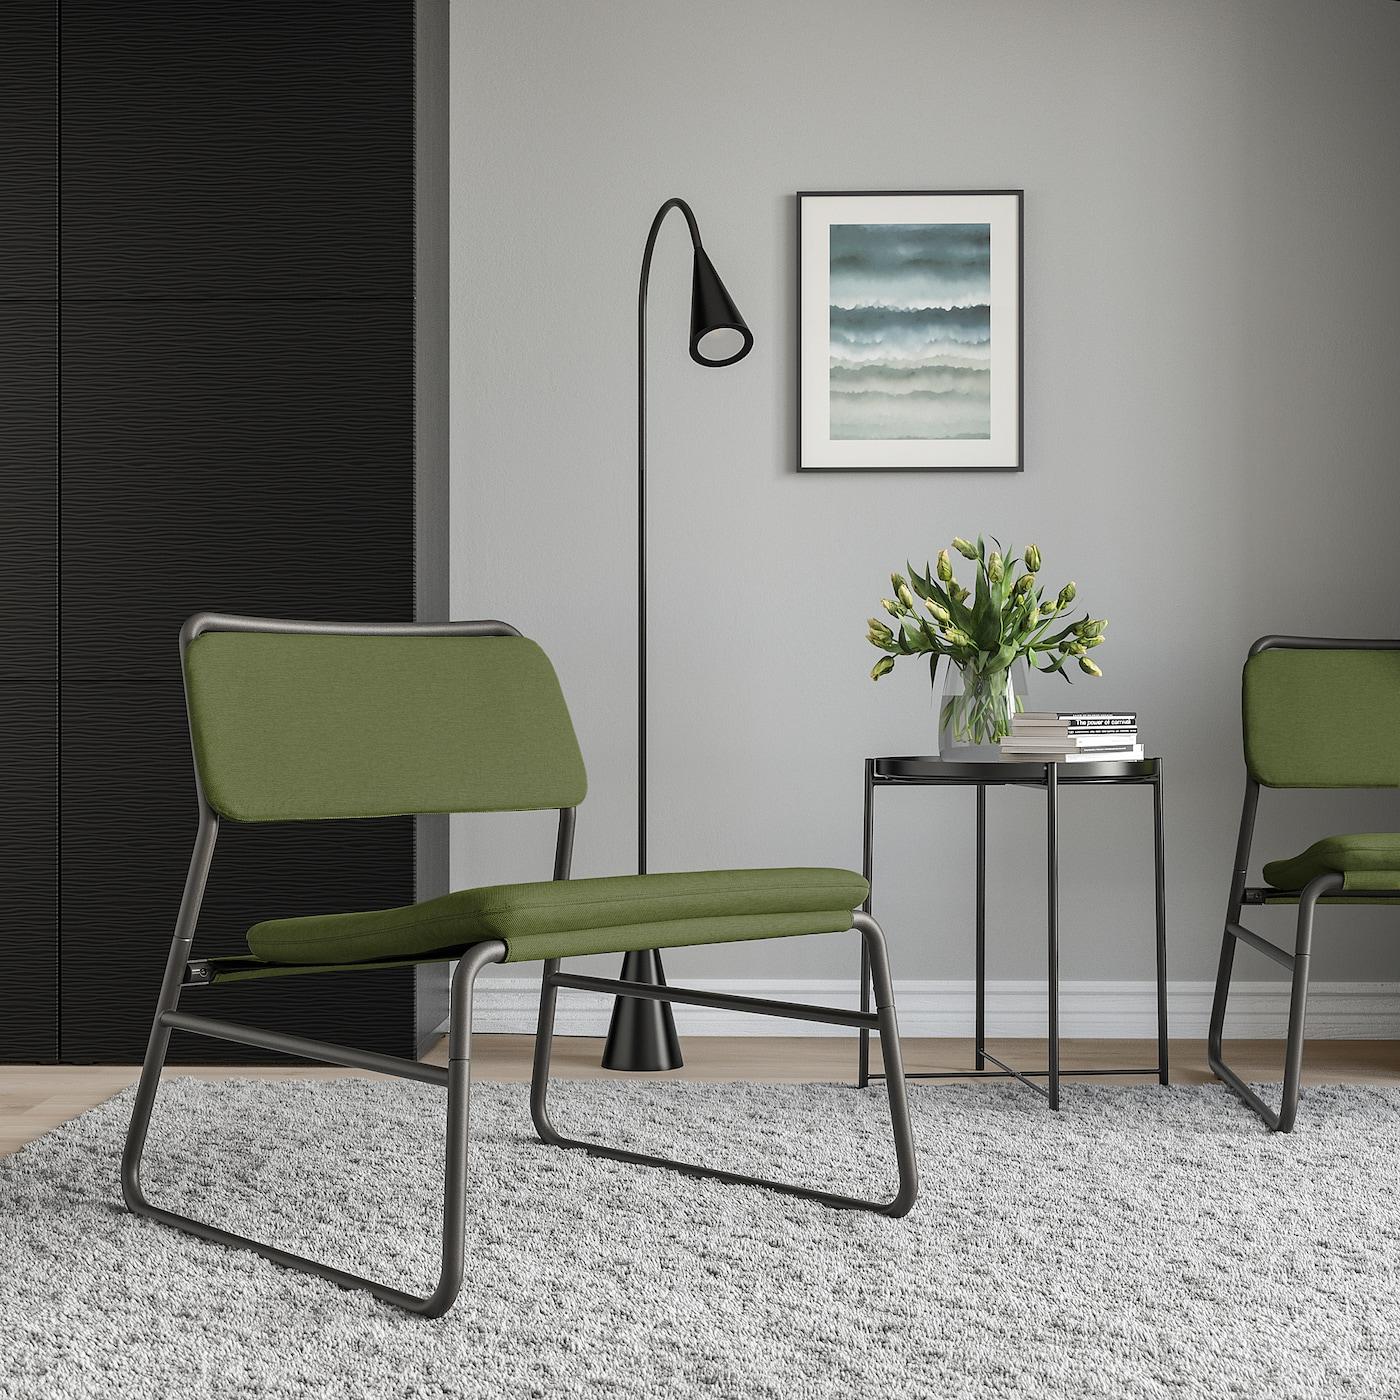 LINNEBÄCK Chair, Orrsta olive-green